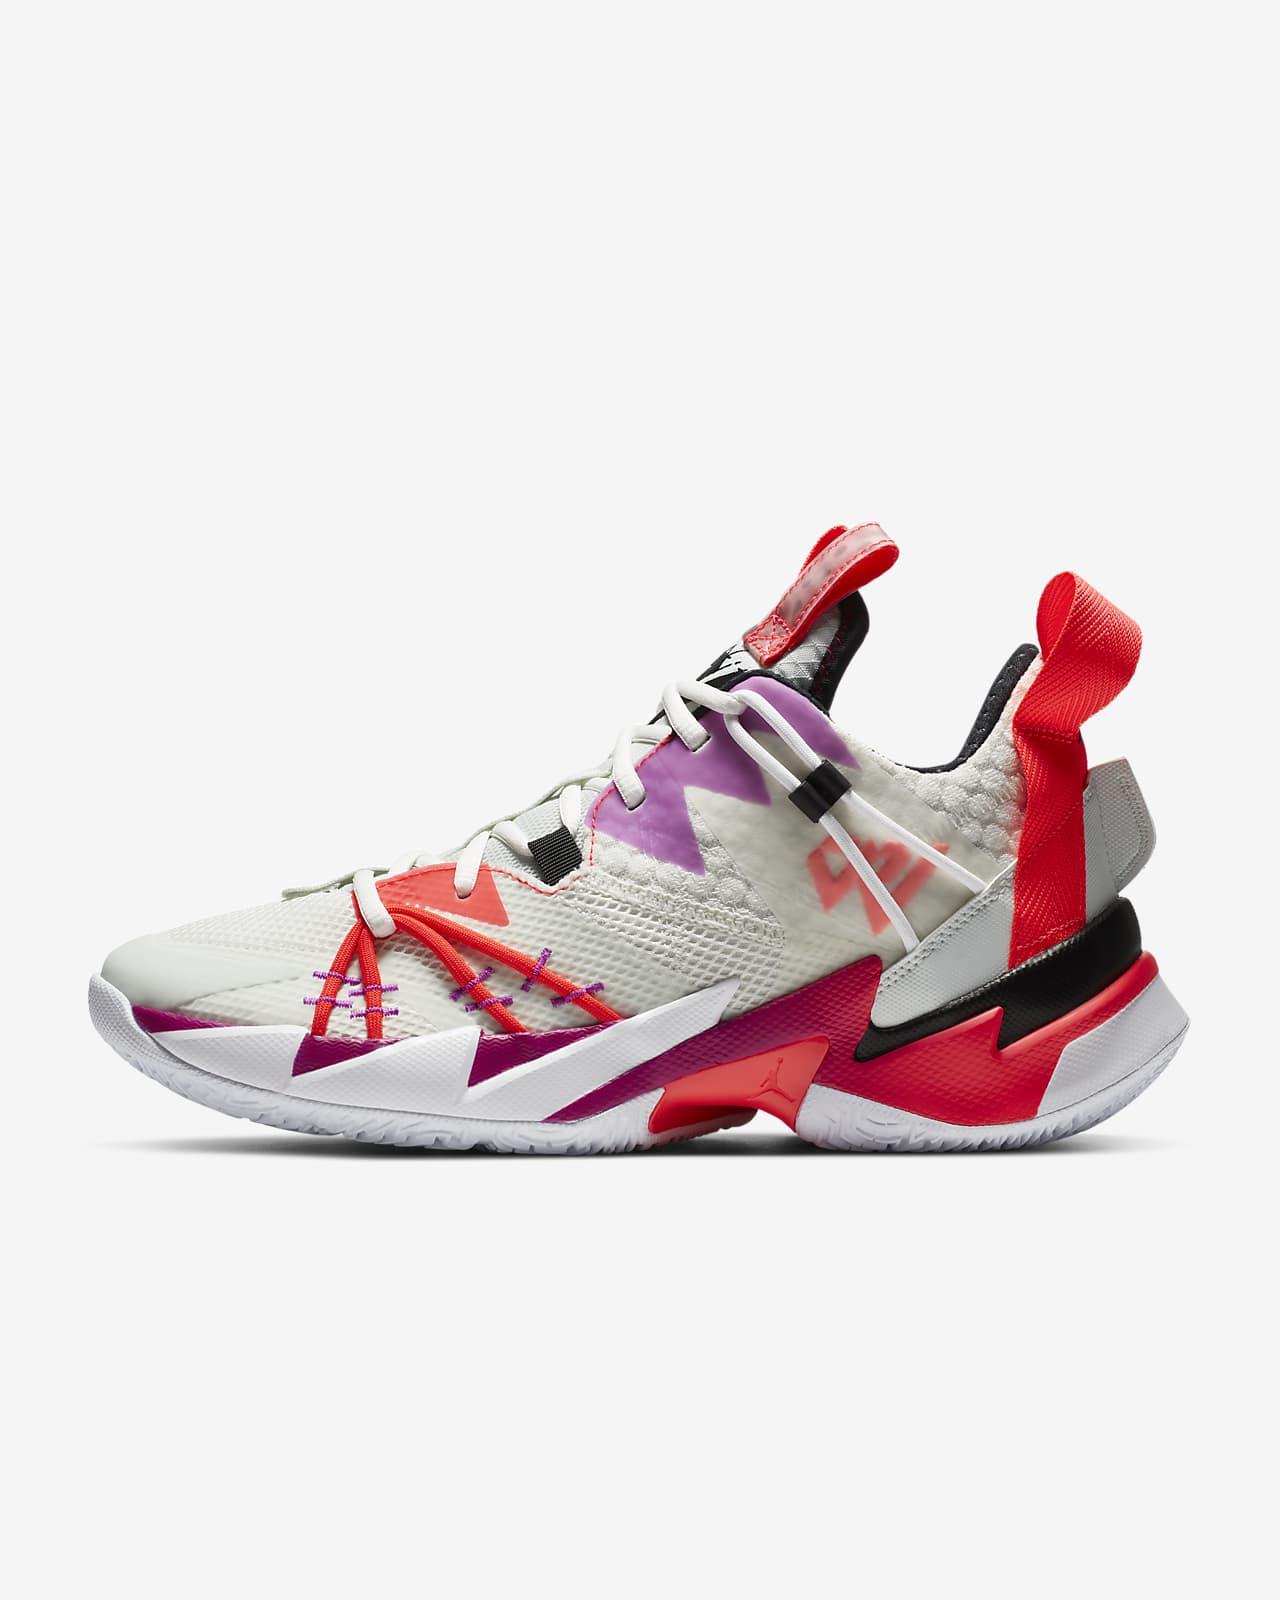 Zer0.3 SE Men's Basketball Shoe. Nike LU